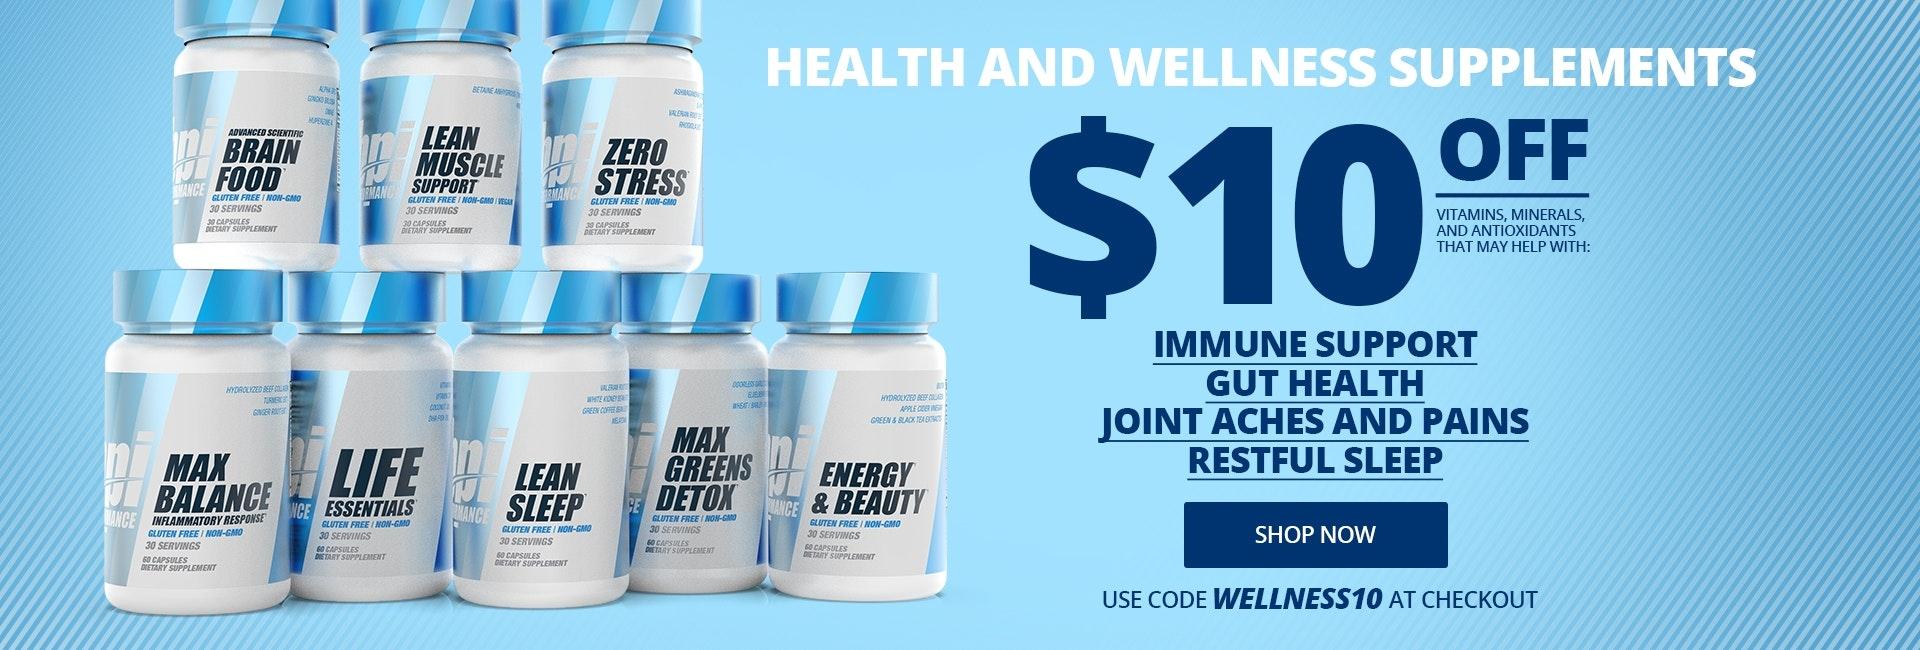 10 Off Health Wellness Supplements 1920 X650 HP DESK